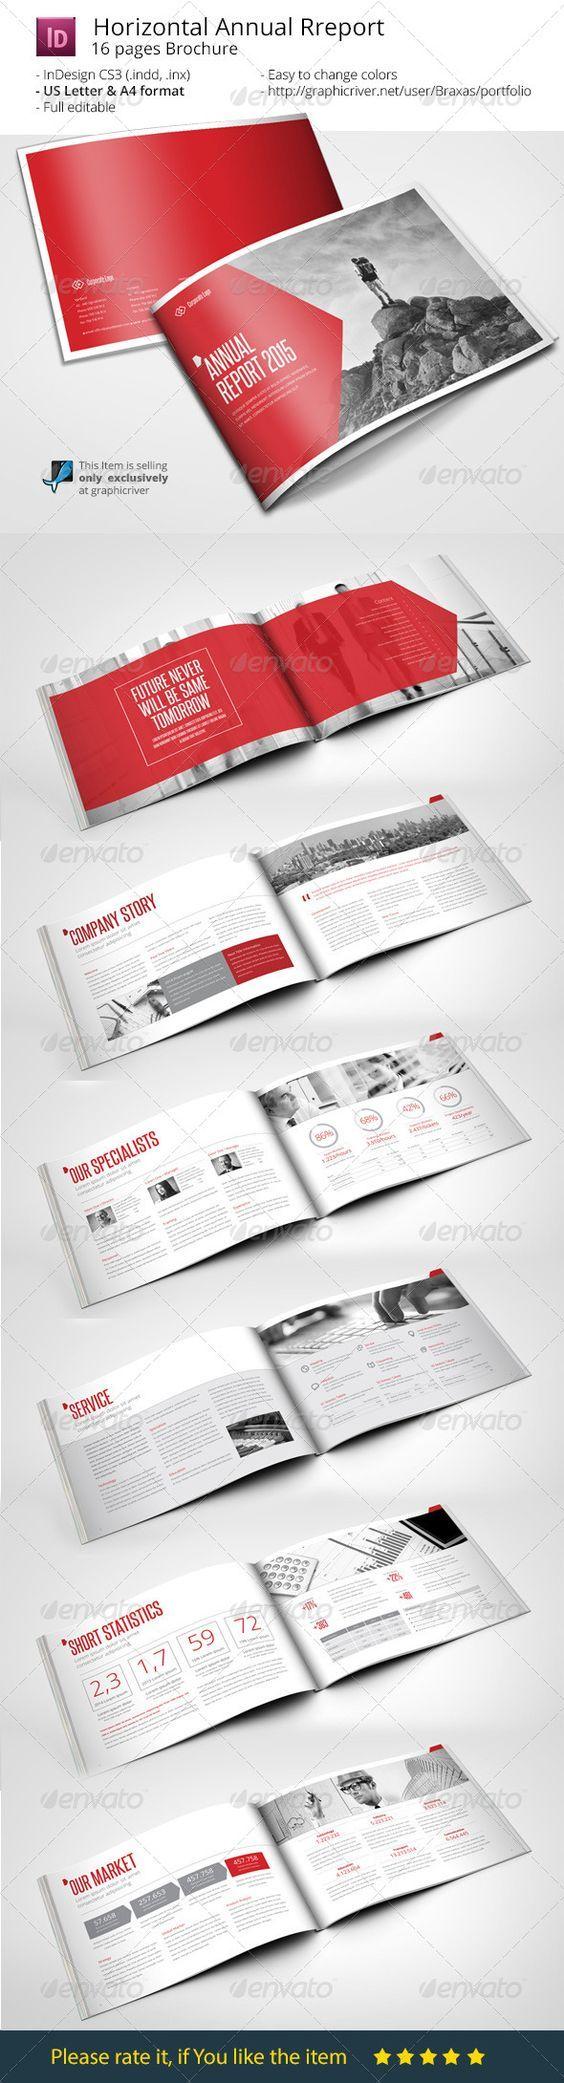 Annual Report 2015 - Informational Brochures: